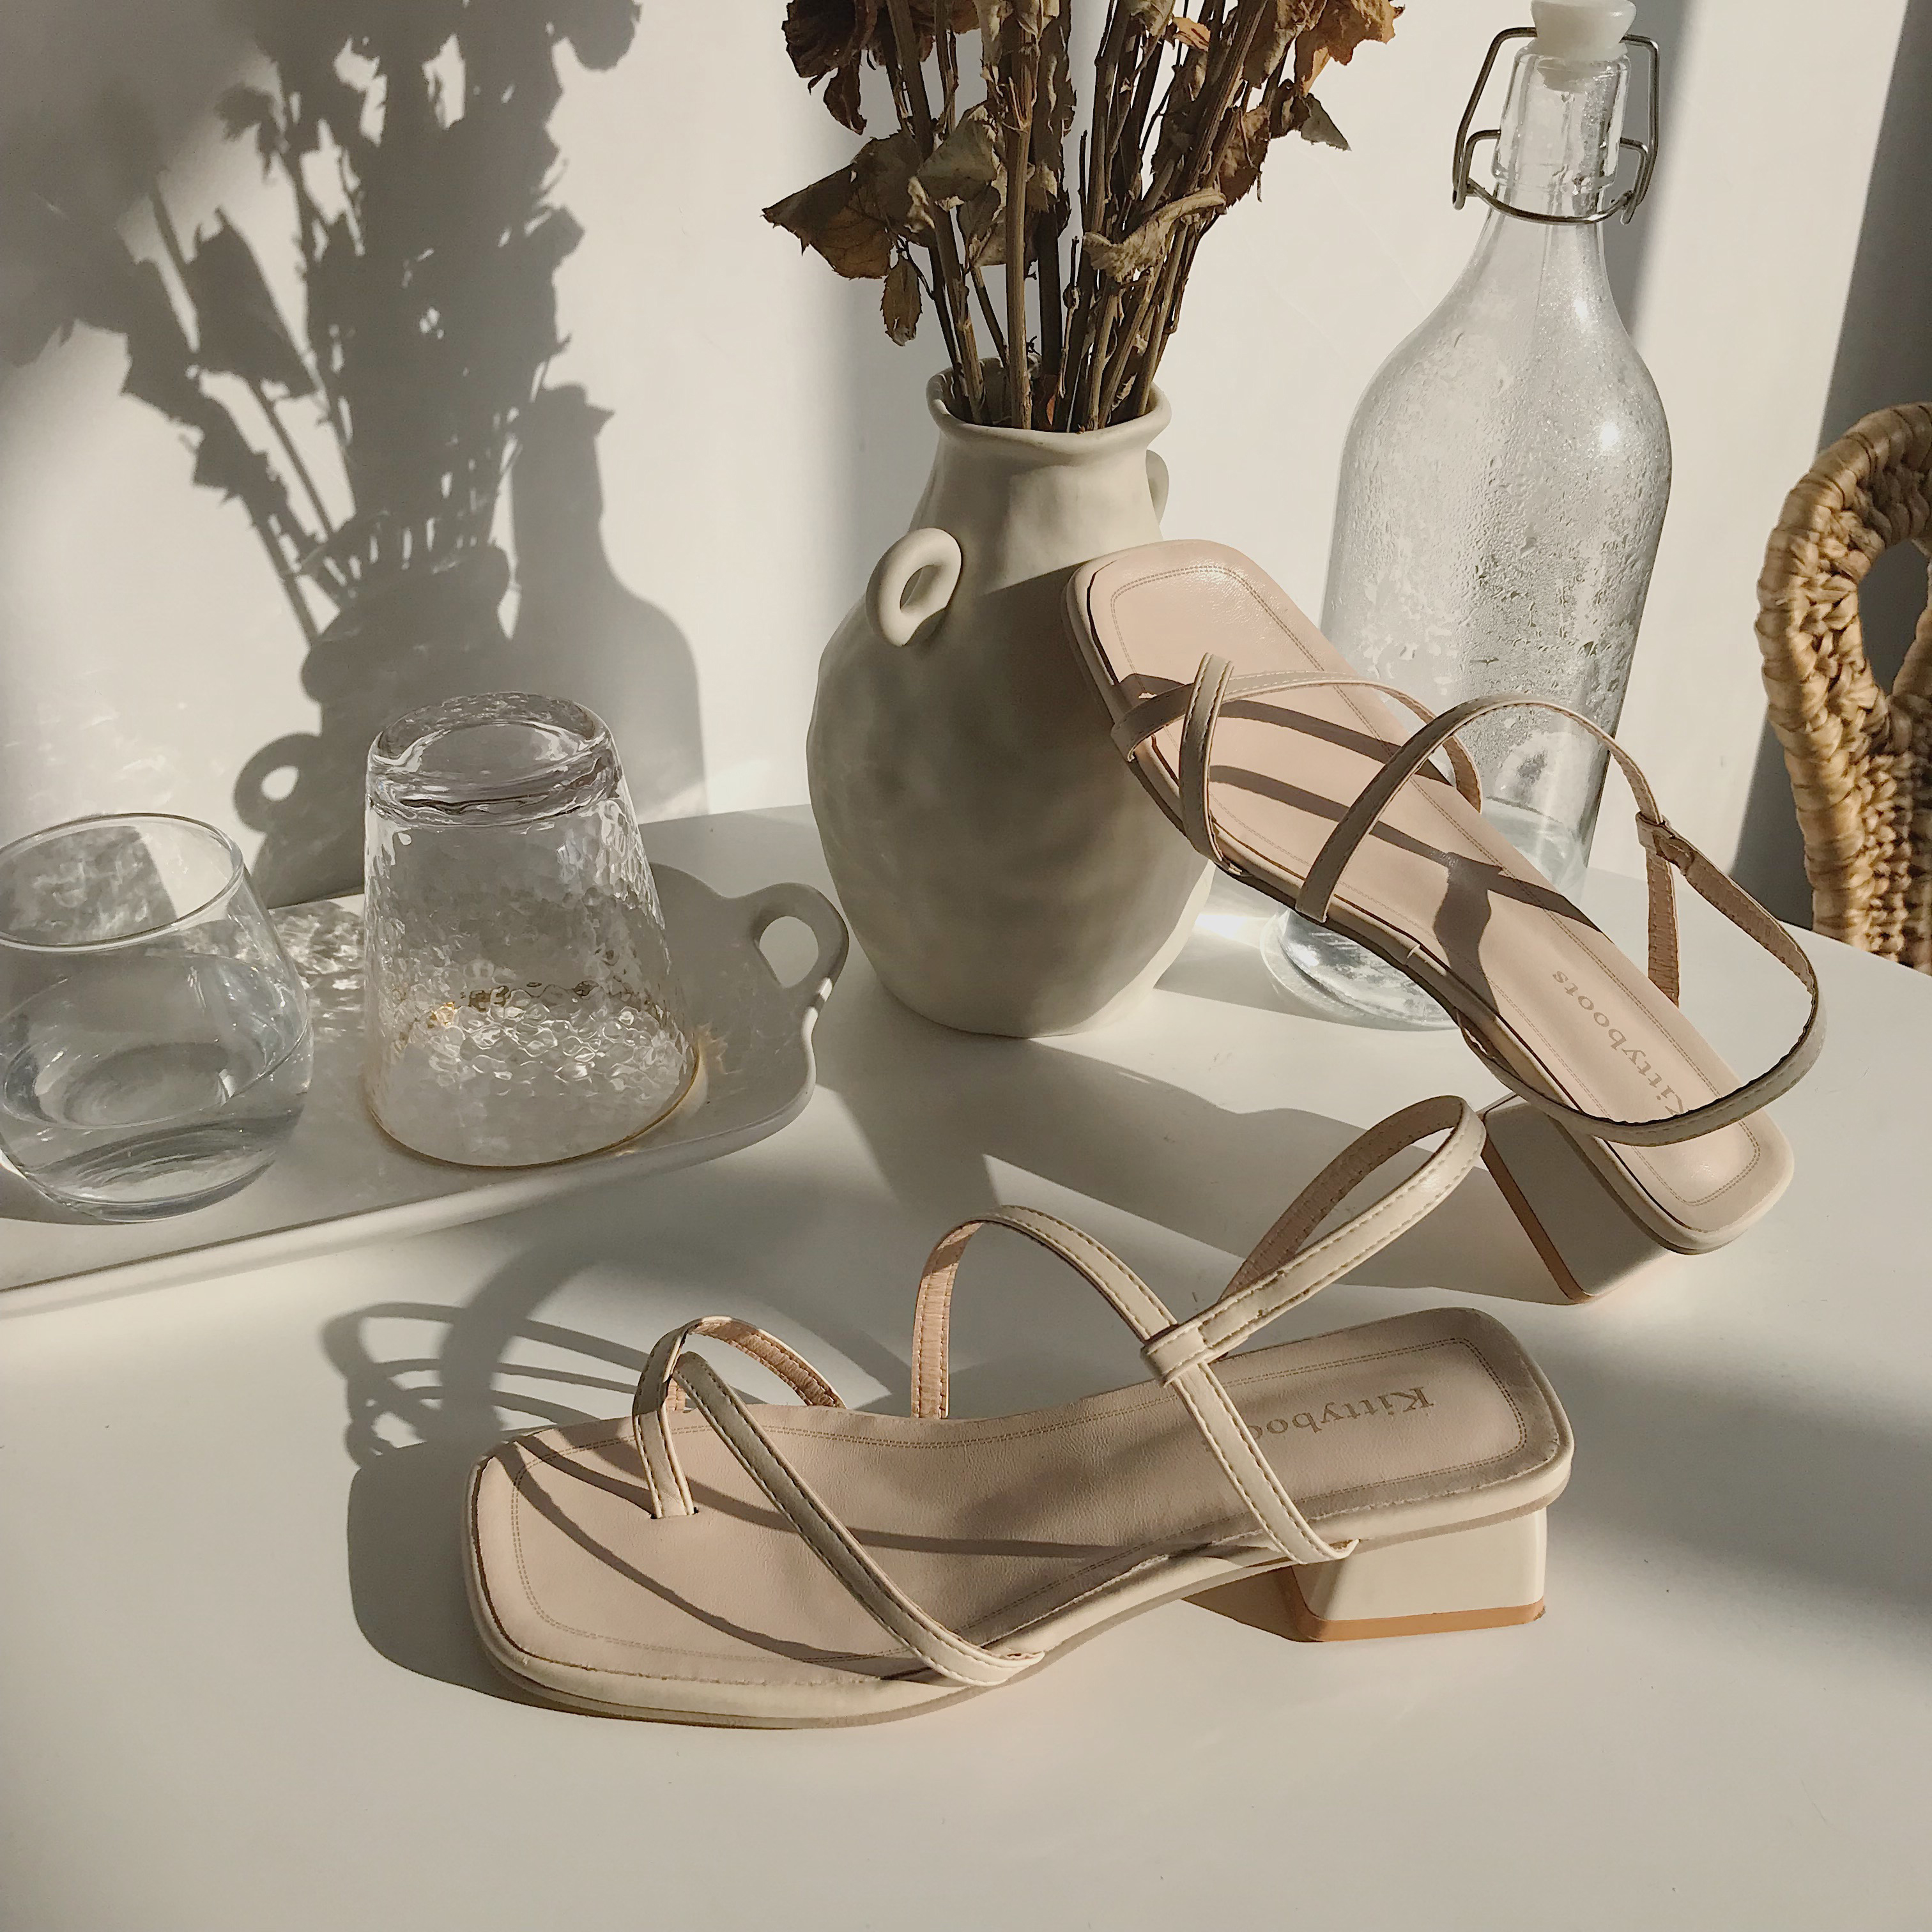 Strap Sandals Women High Heels Sandals Ladies Slip On Sandals Summer Women Shoes 2019 New Beach Slippers Ladies Soft Sandals